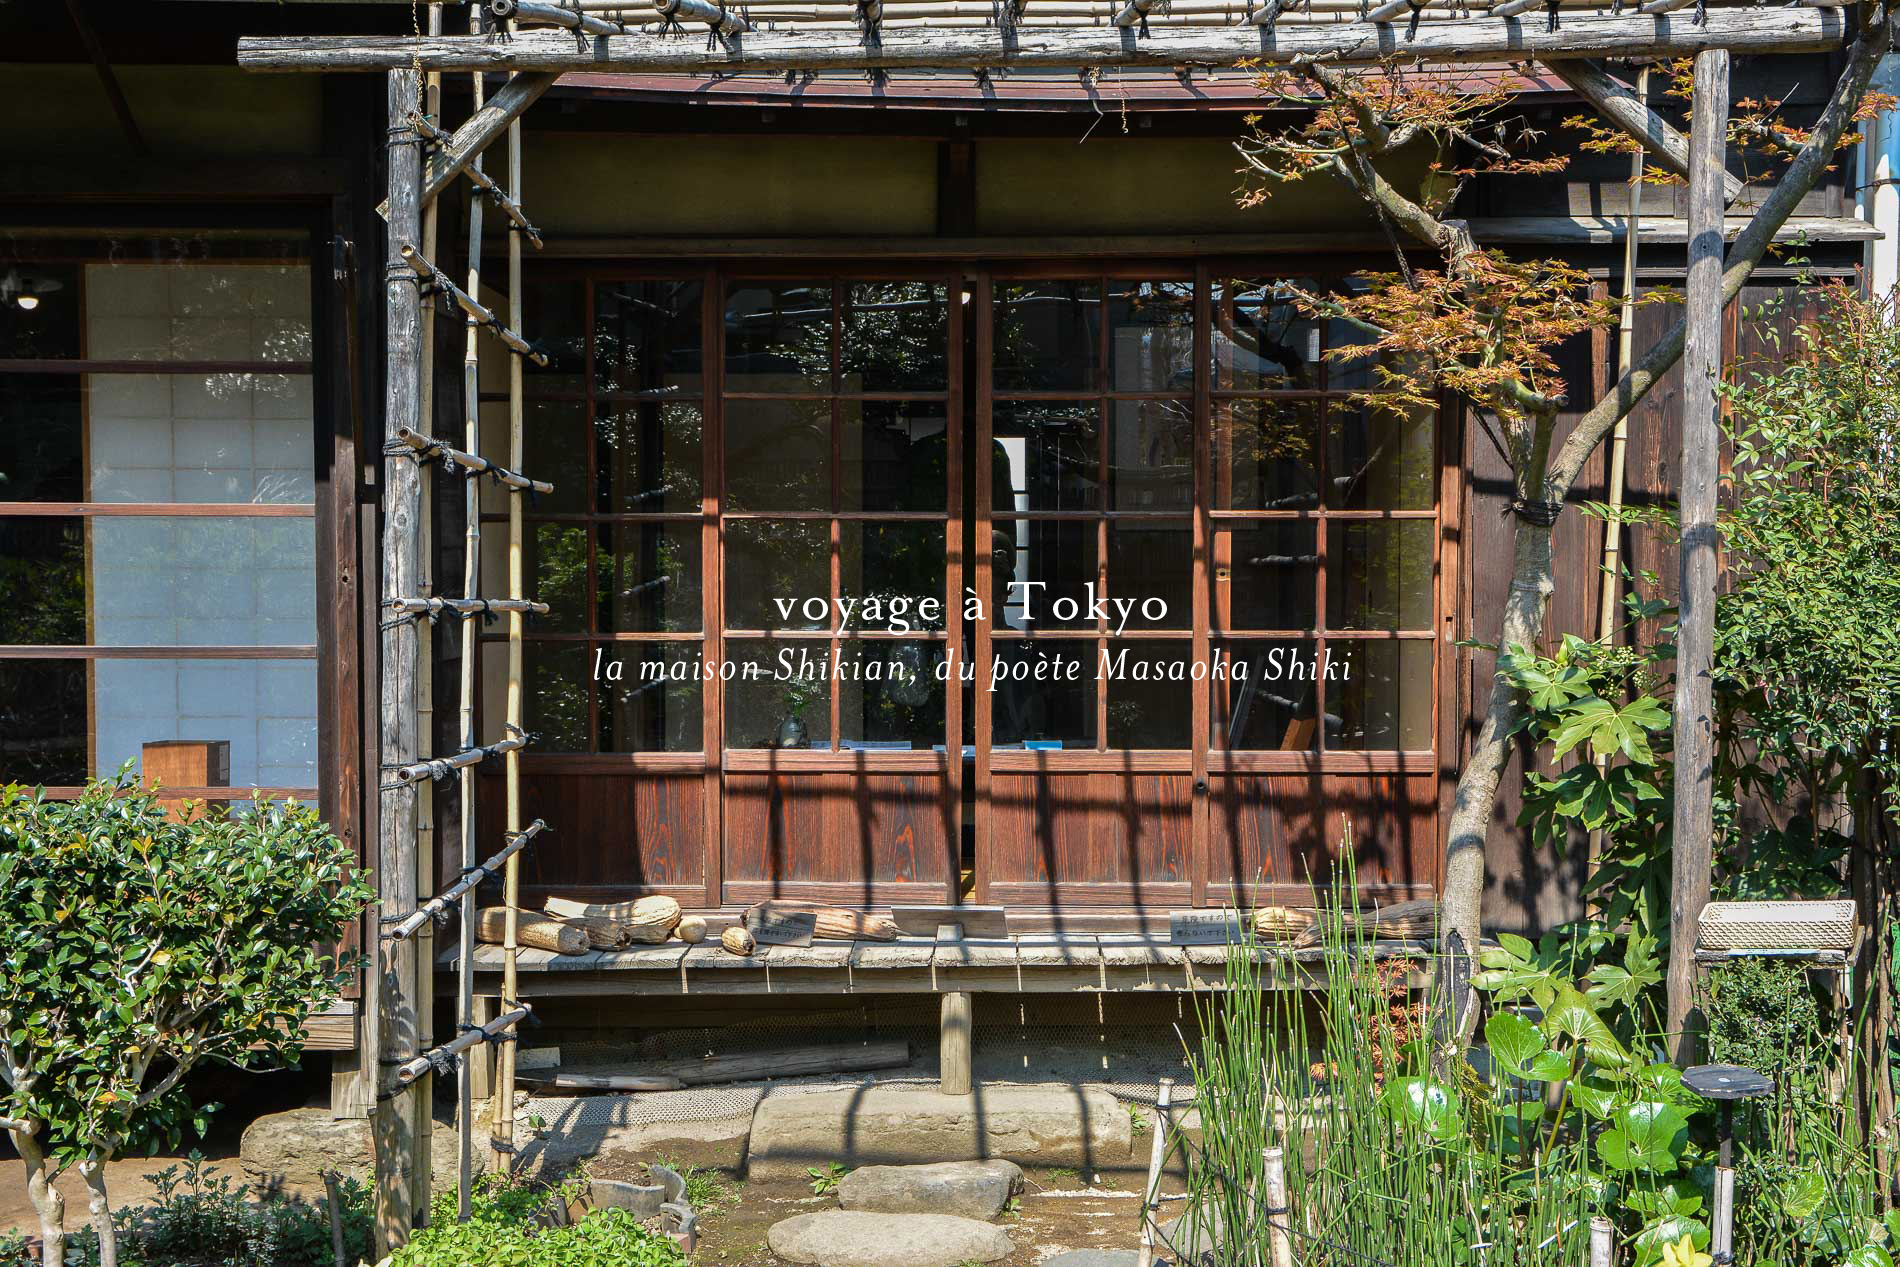 Voyage tokyo yanaka maison shikian masaoka shiki poete visuel le poly dre - Maison de tokyo paris ...